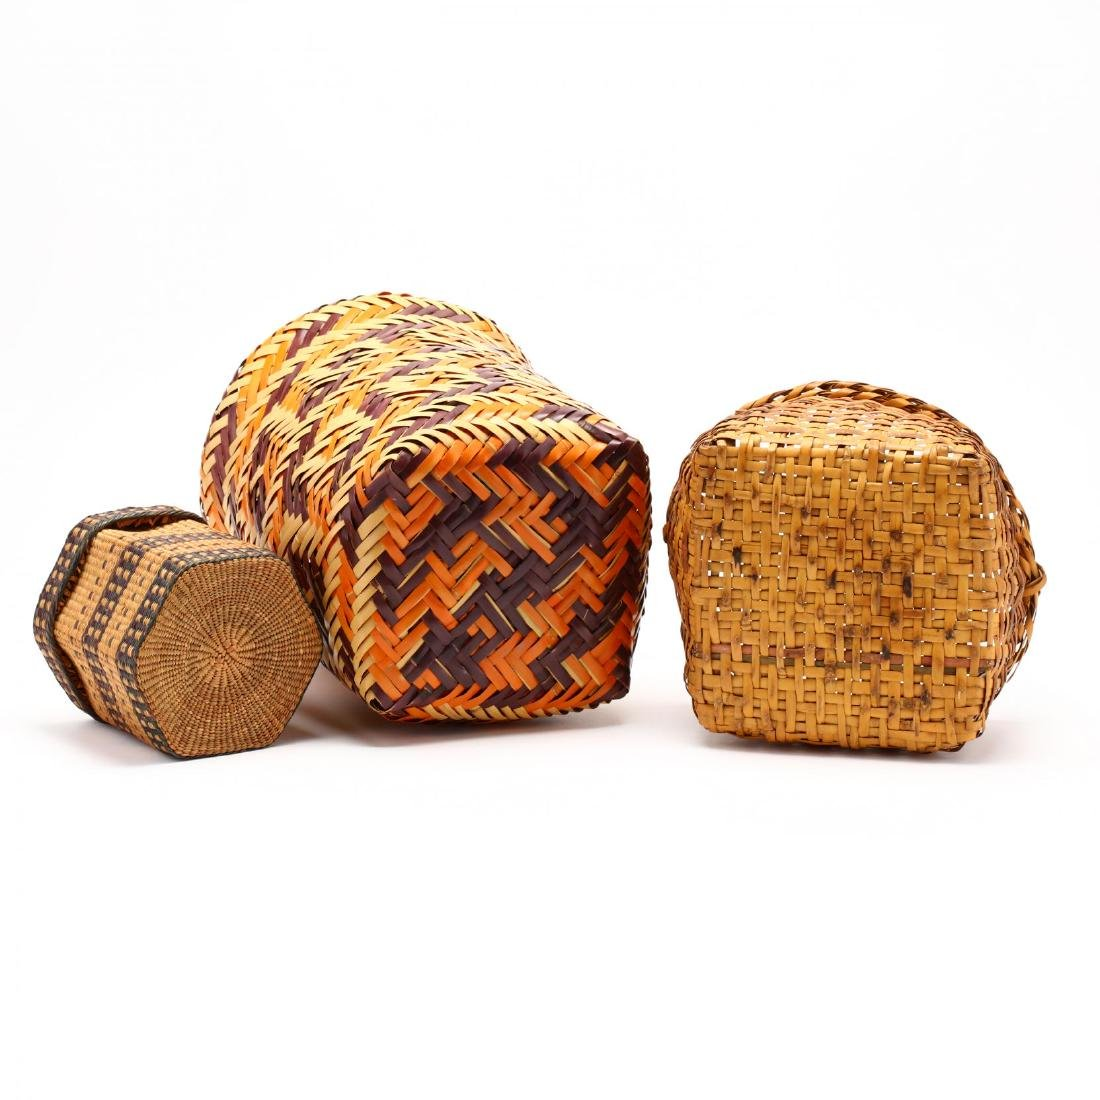 Three Native American Baskets - 3